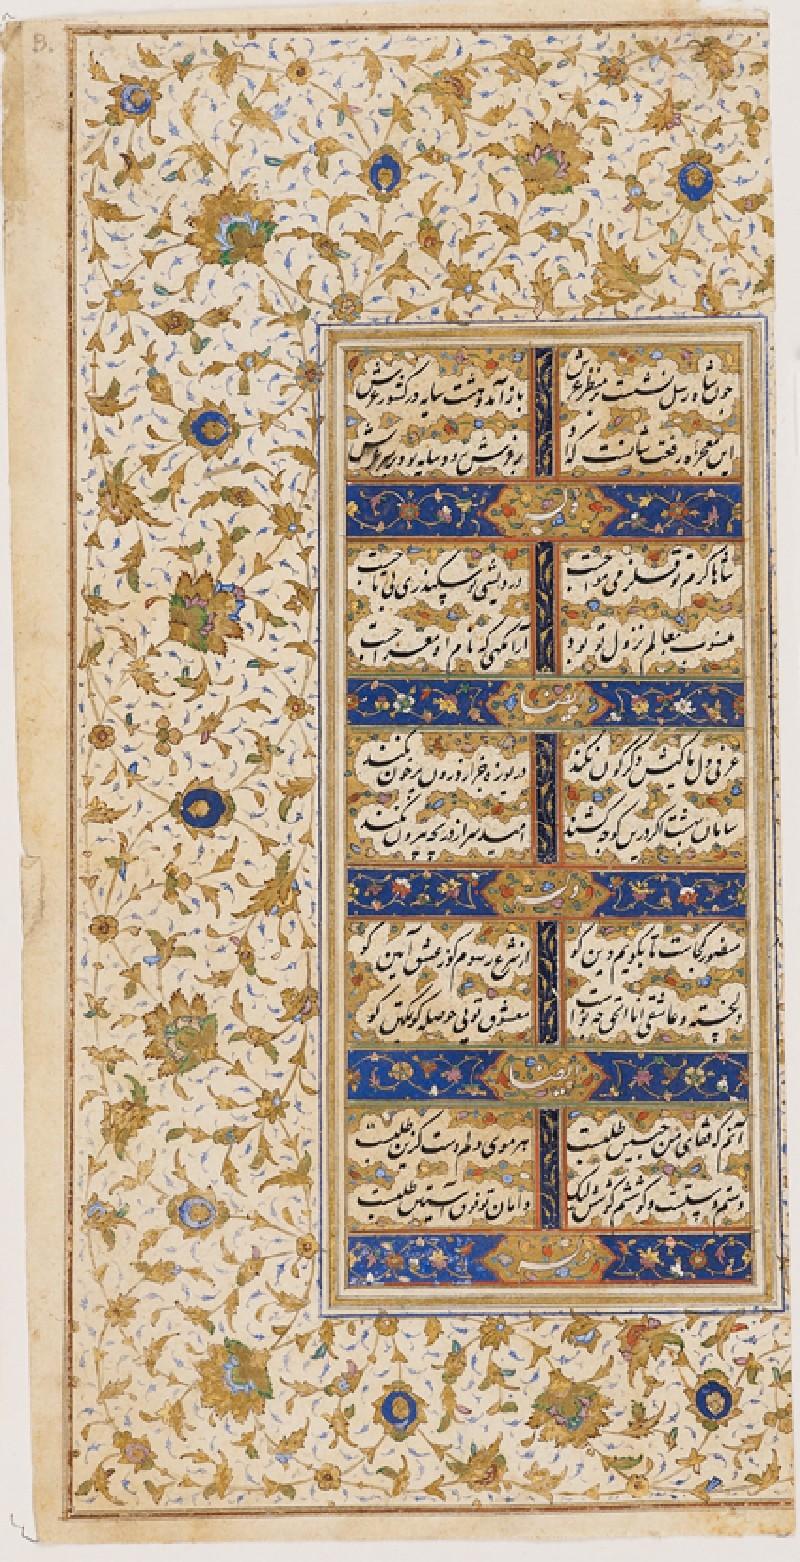 Opening page from the Ruba'yat of Urfi of Shiraz